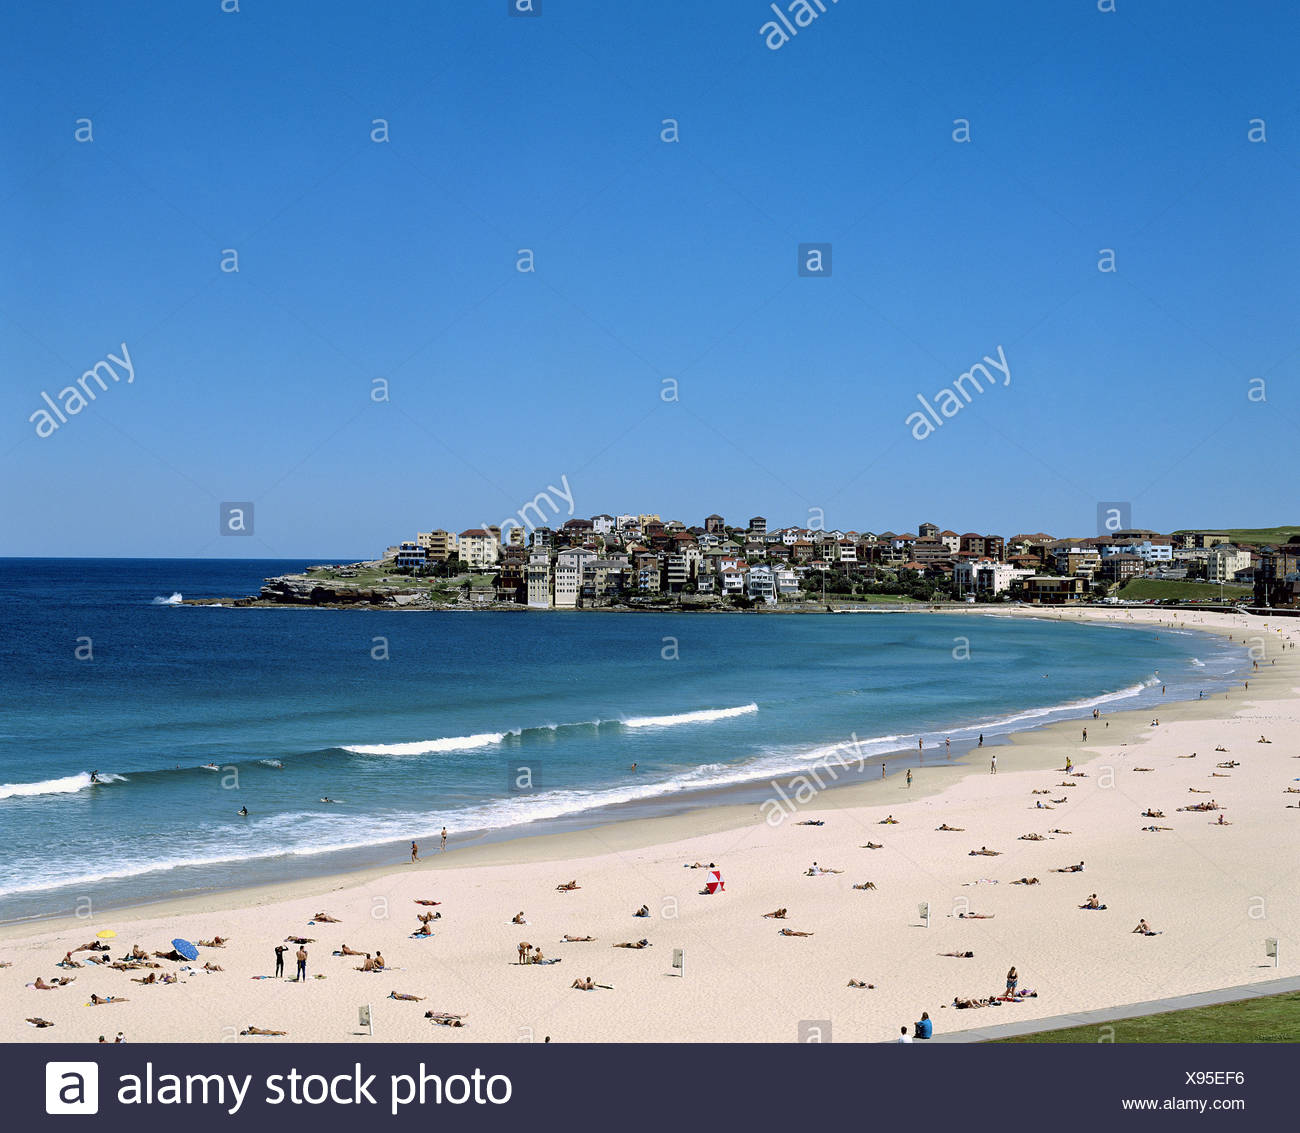 Australia bathing Bondi Beach bay Eastern Suburb coast life beach seashore Sydney - Stock Image